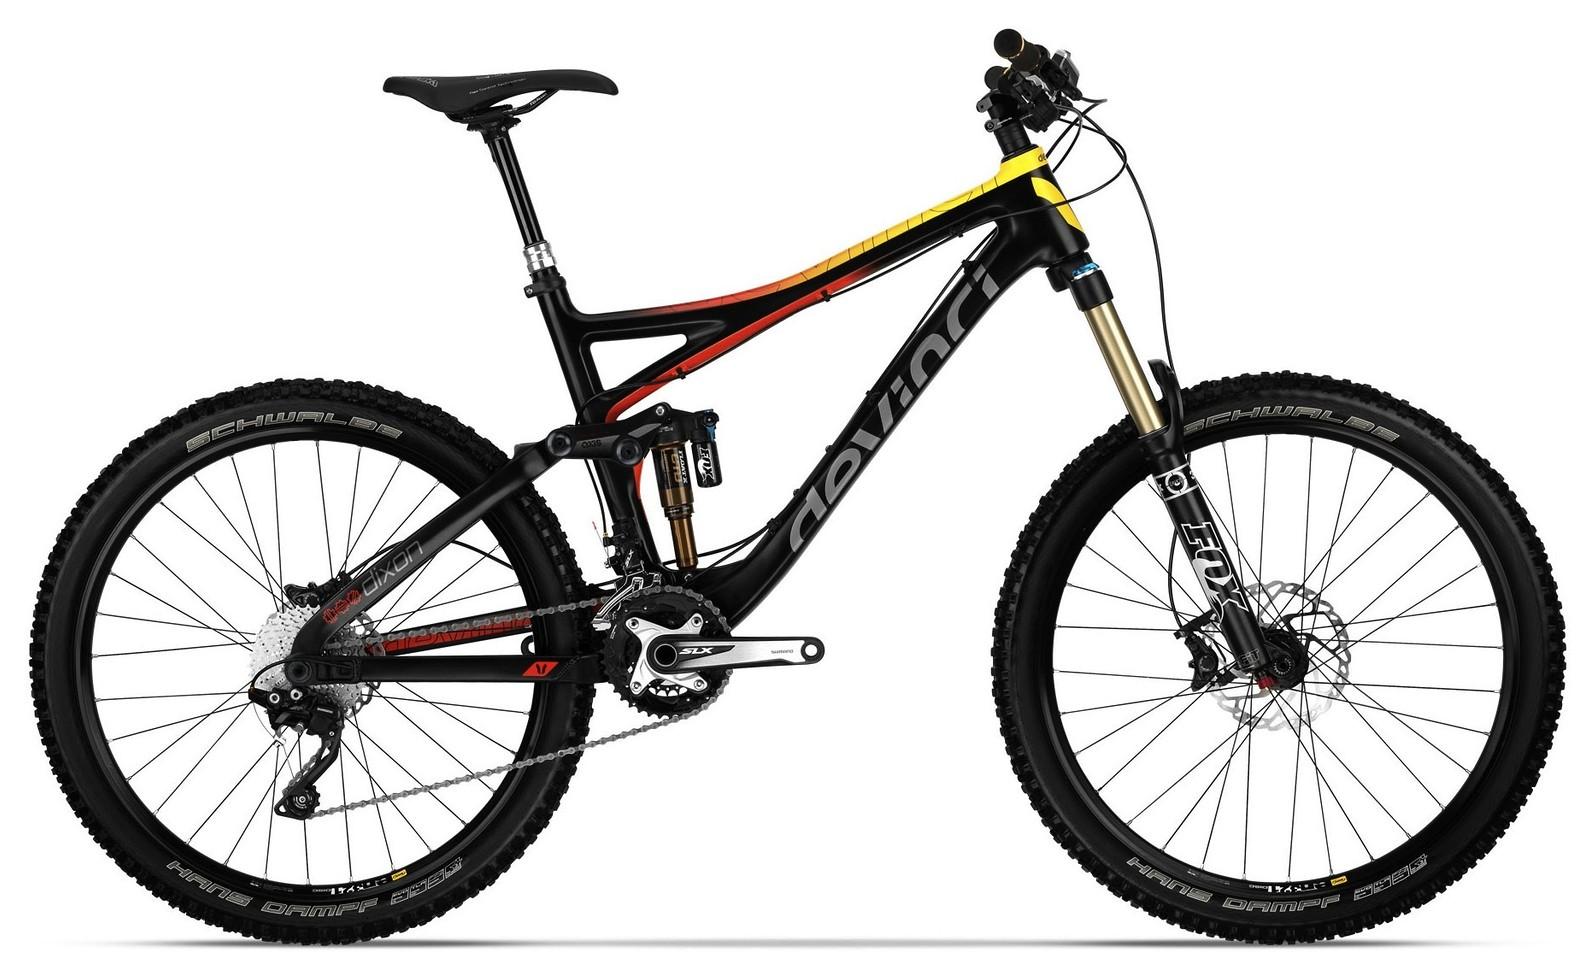 Bike - 2014 Devinci Dixon Carbon RXS